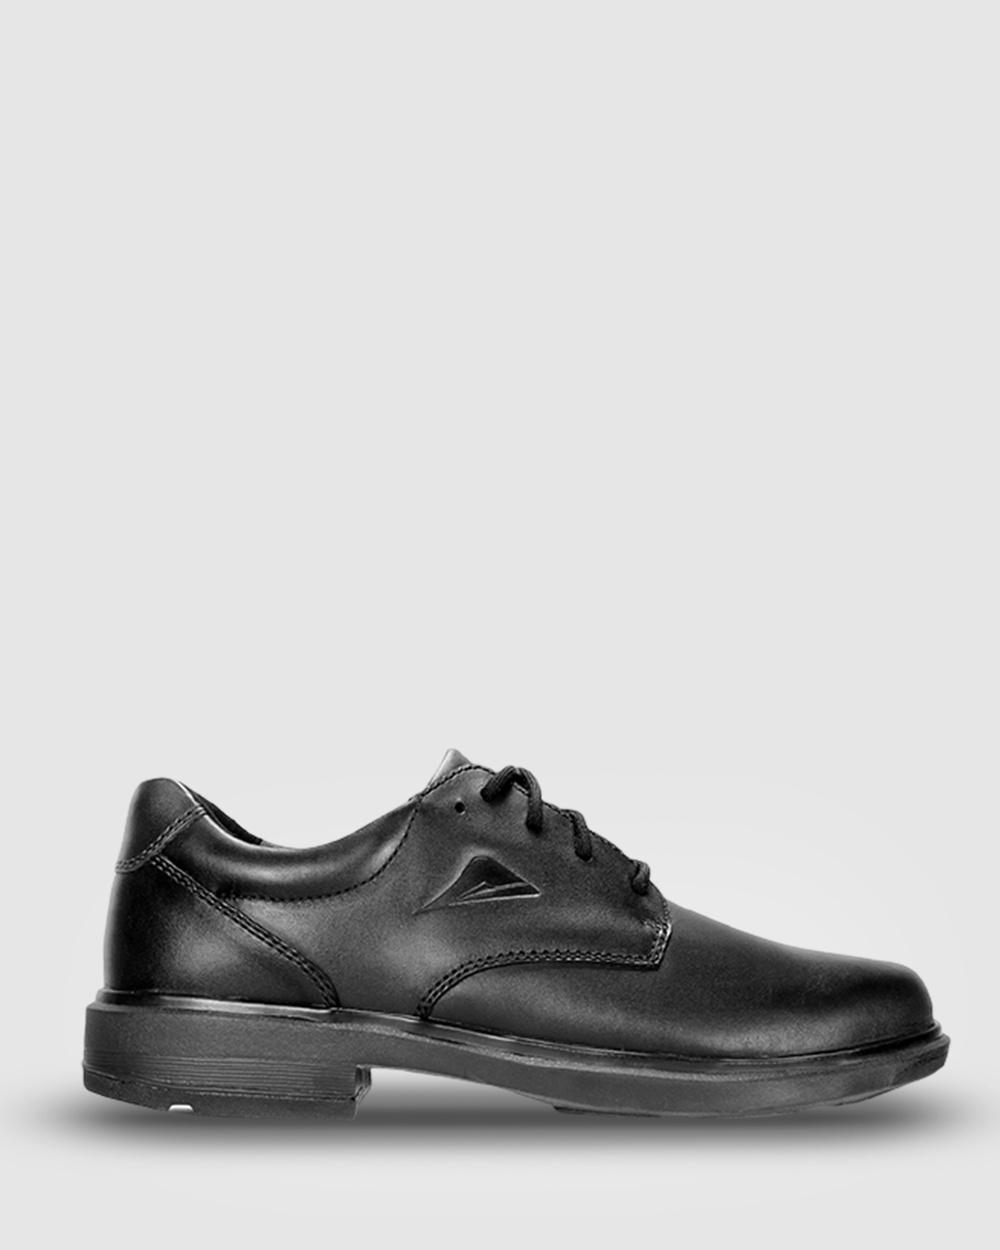 Ascent Apex Max 3 C Width School Shoes Black Australia